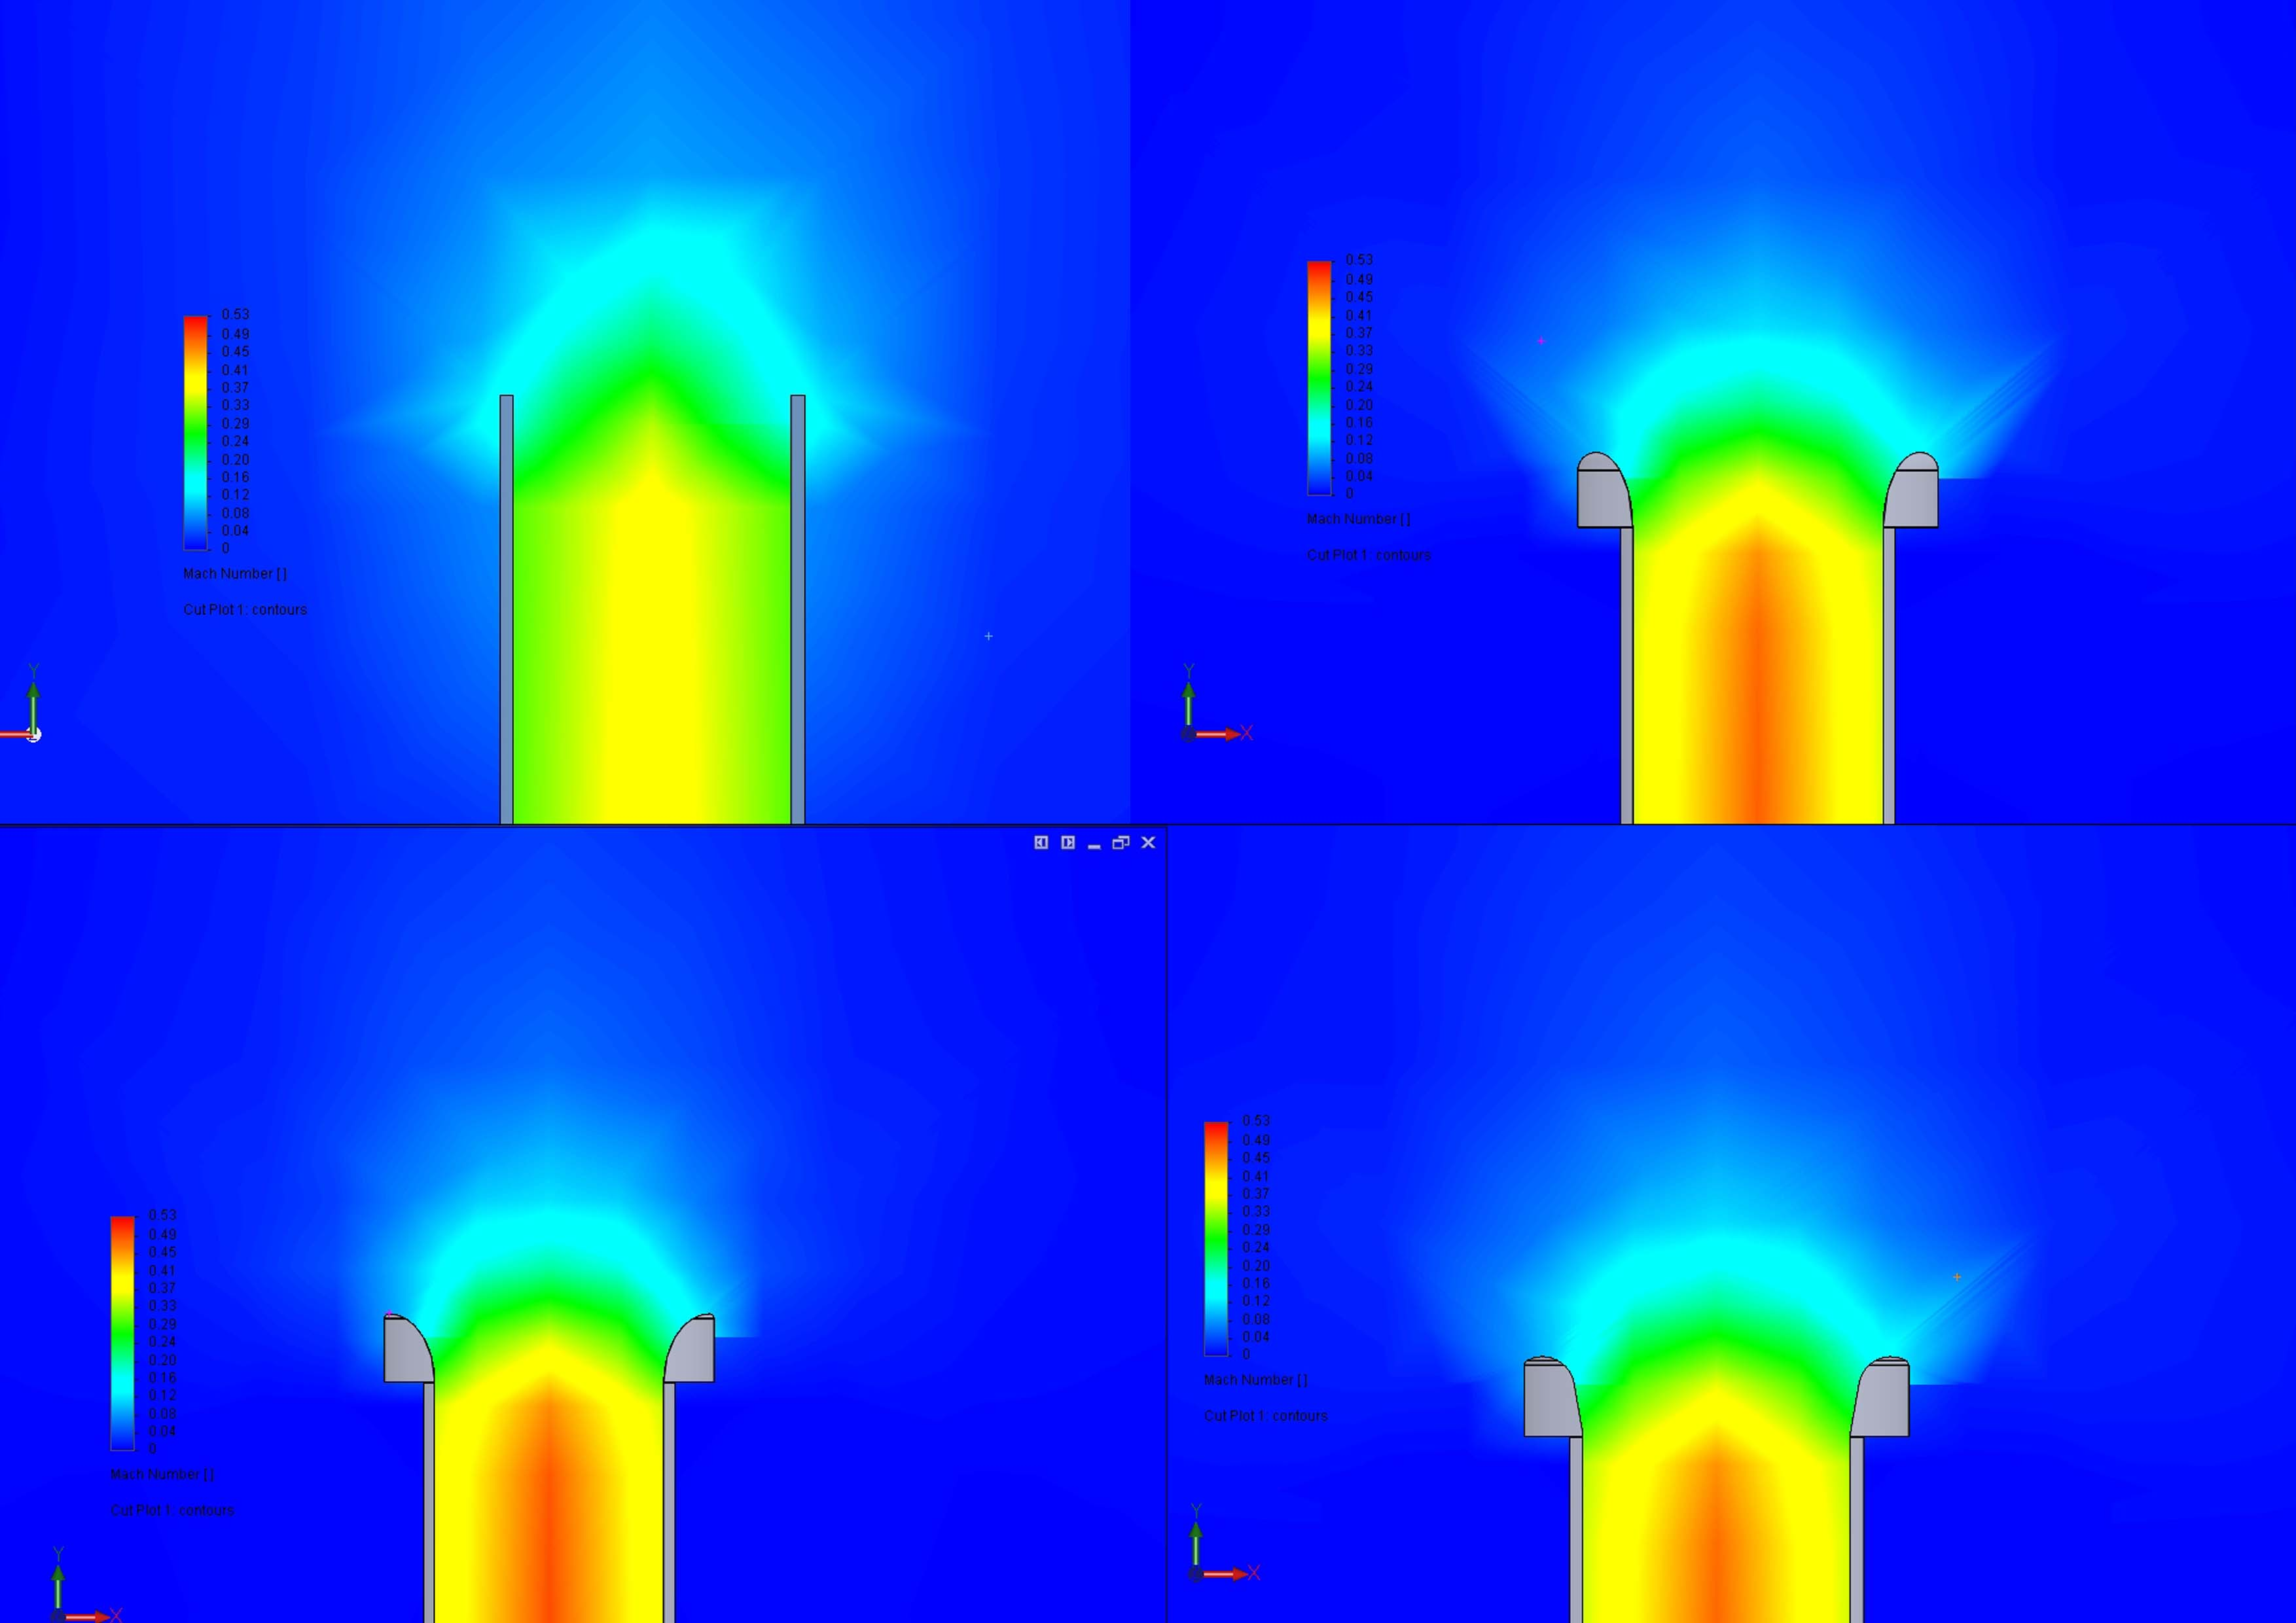 Bellmouth Intake Simulations